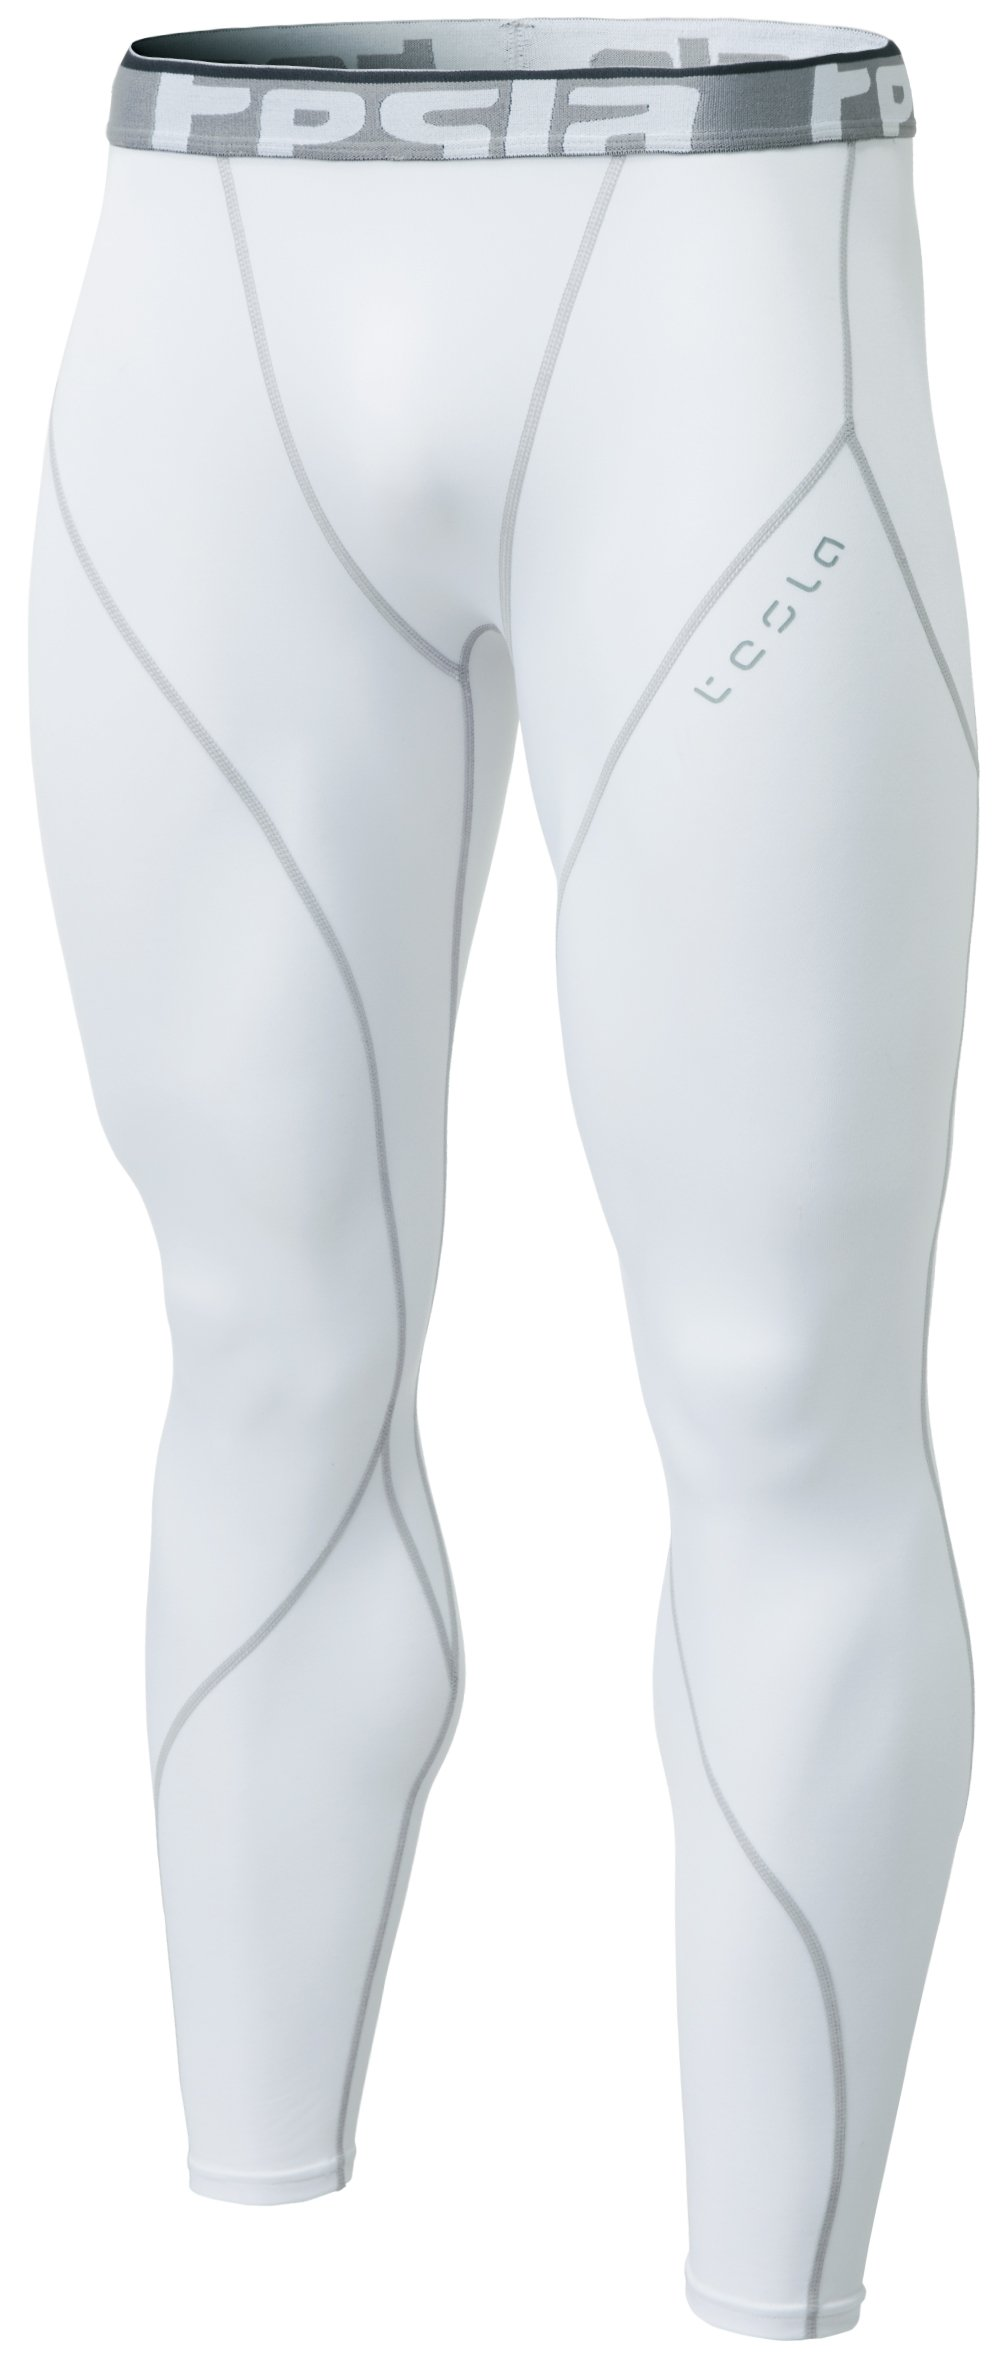 Tesla CLSL TM-YUP33-WHT_Large Men's Thermal Wintergear Compression Baselayer Pants Leggings Tights YUP33